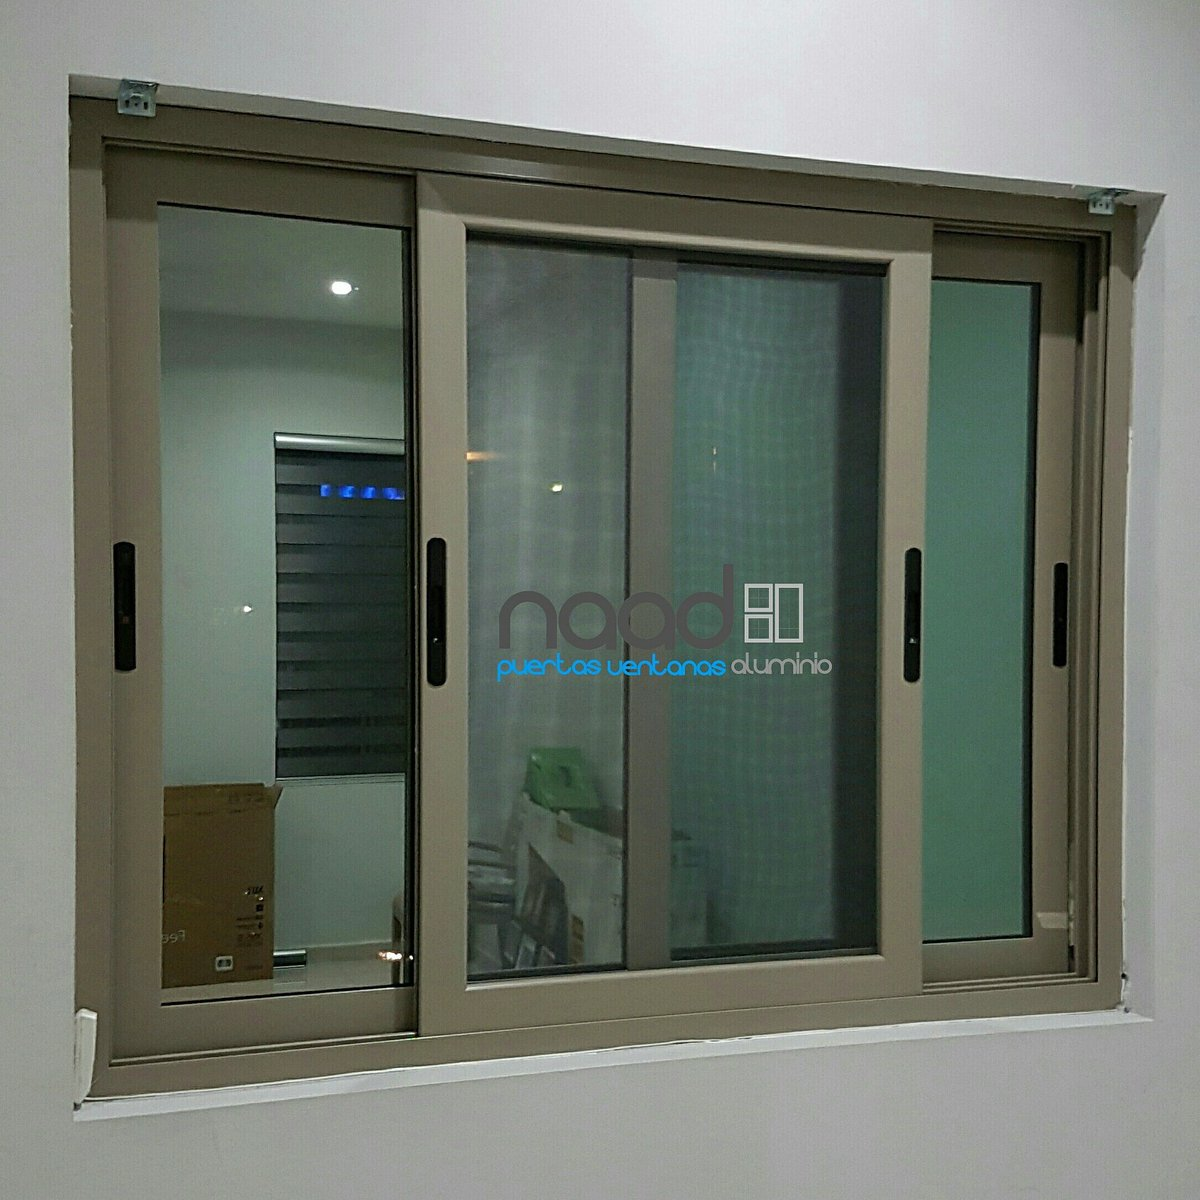 Naad aluminio naad aluminio twitter for Ver ventanas de aluminio blanco